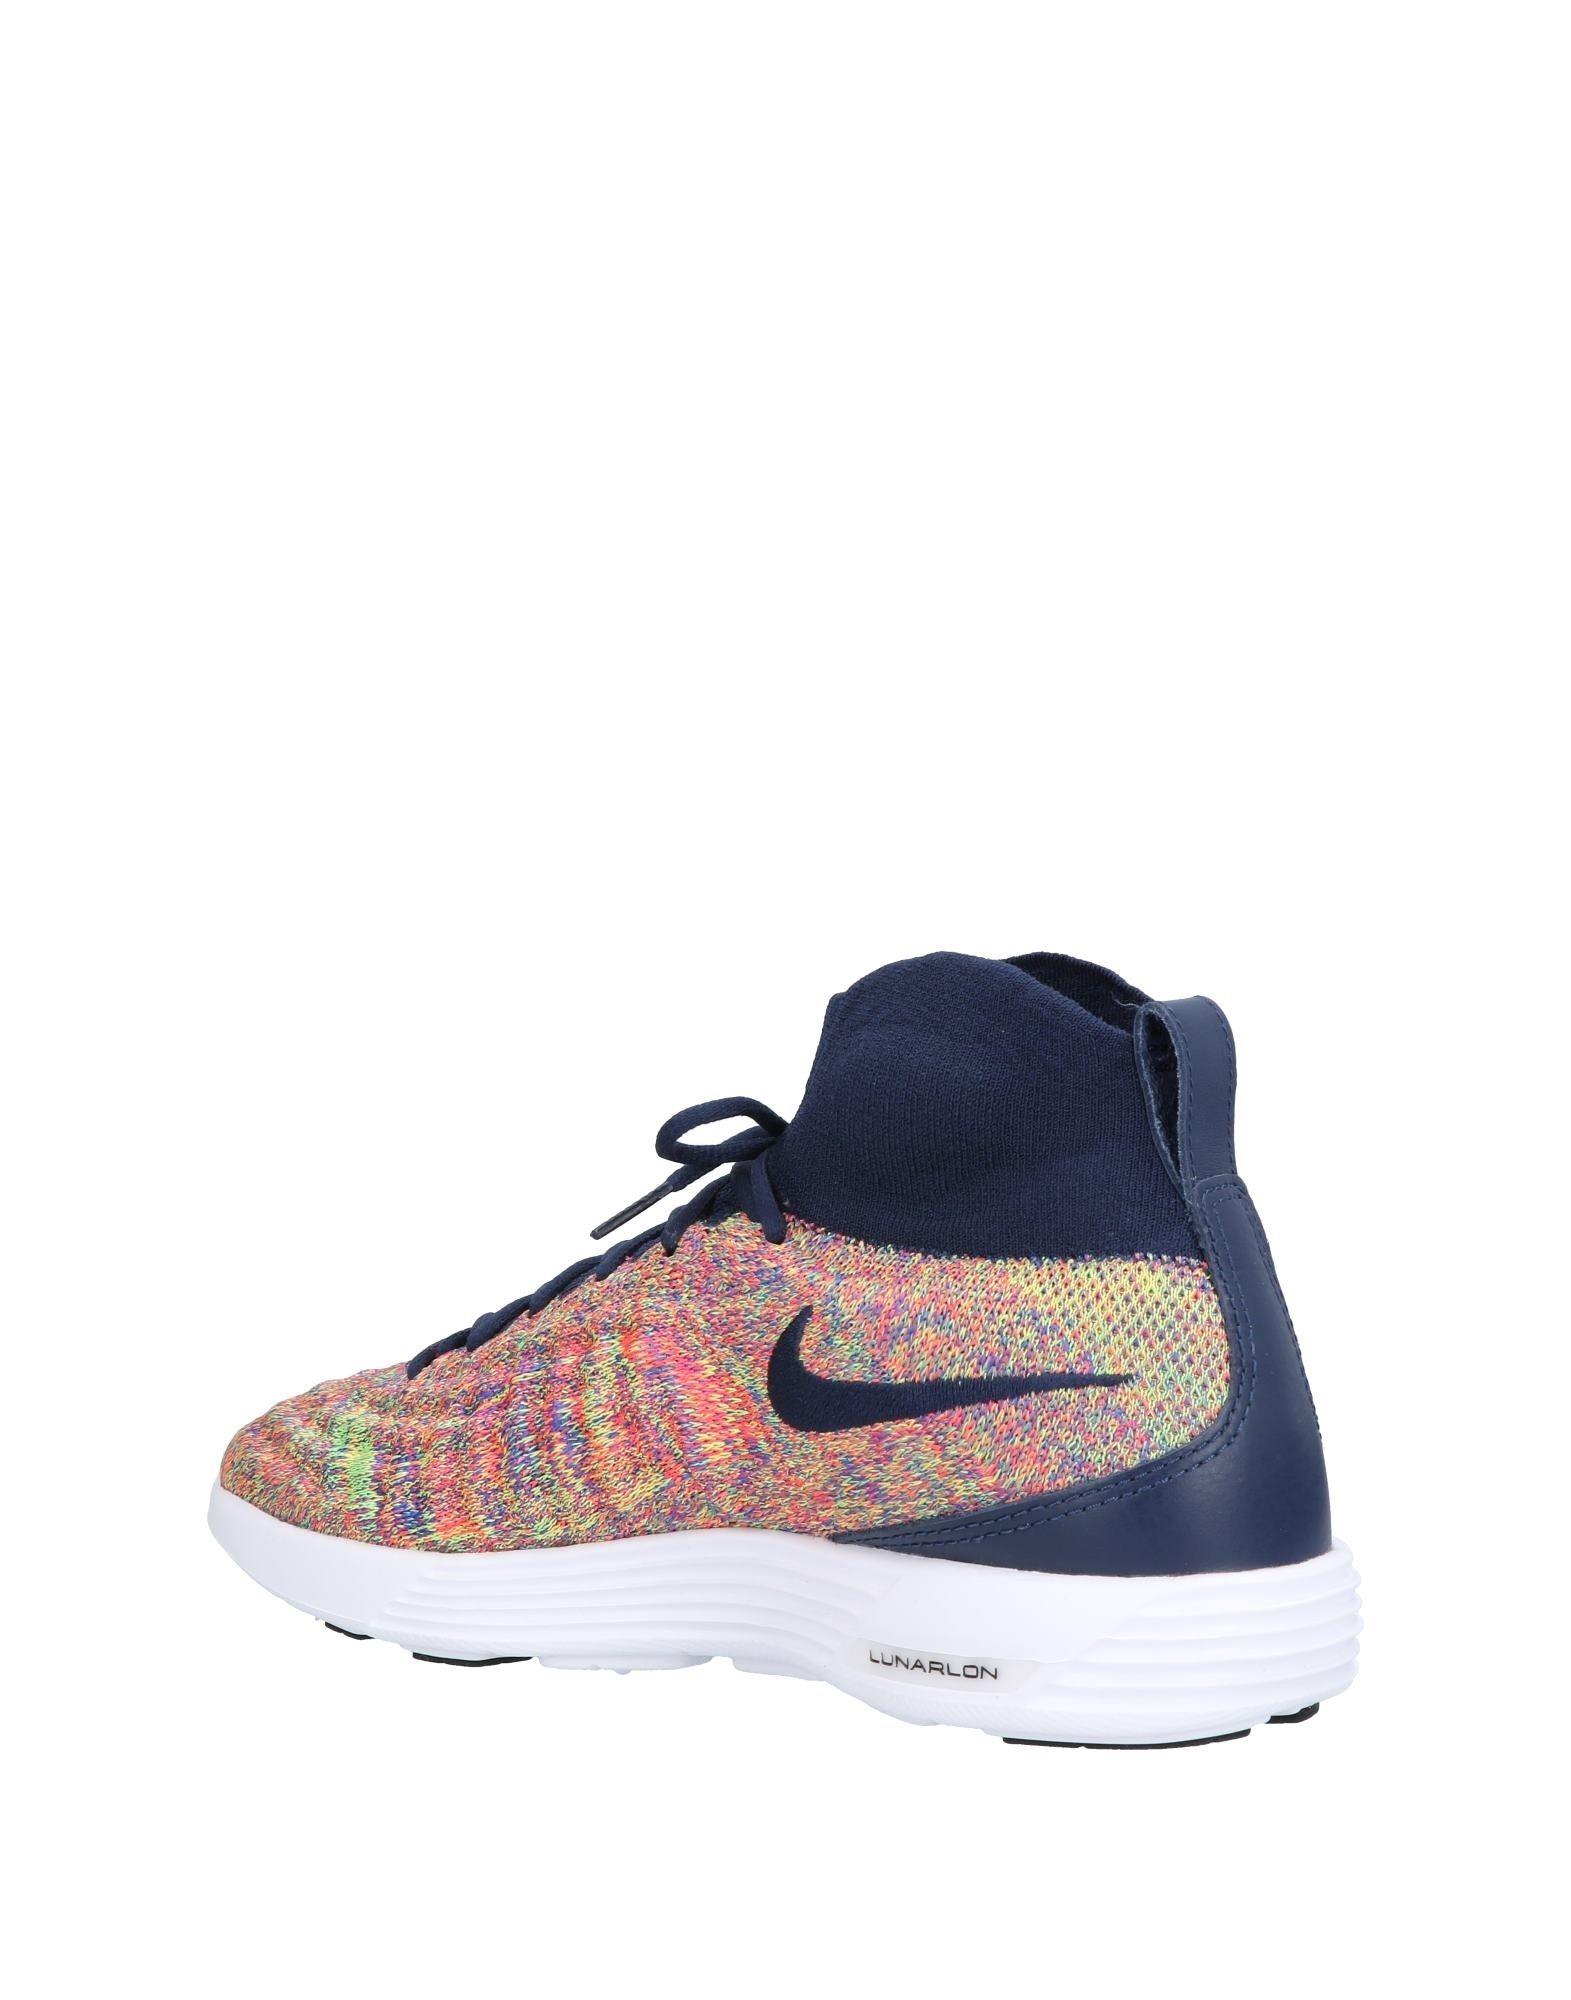 Nike Sneakers - Men Nike Sneakers online on    Australia - 11485802HF e7b9a8